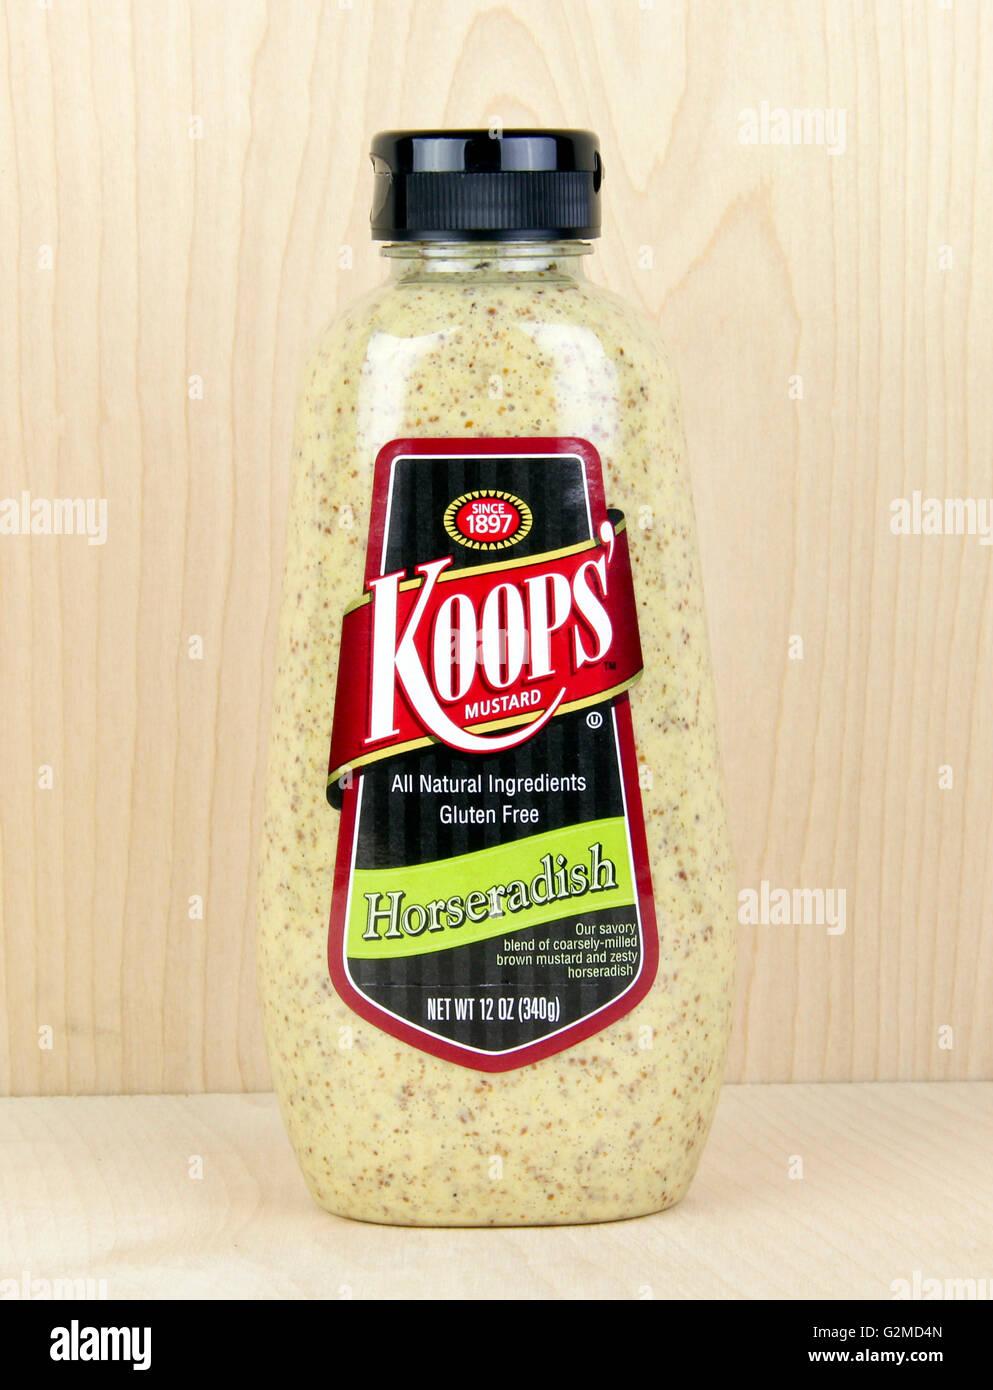 Spencer, Wisconsin, May, 31, 2016  Jar of  Koops' Horseradish mustard   Koops' is an American based company - Stock Image